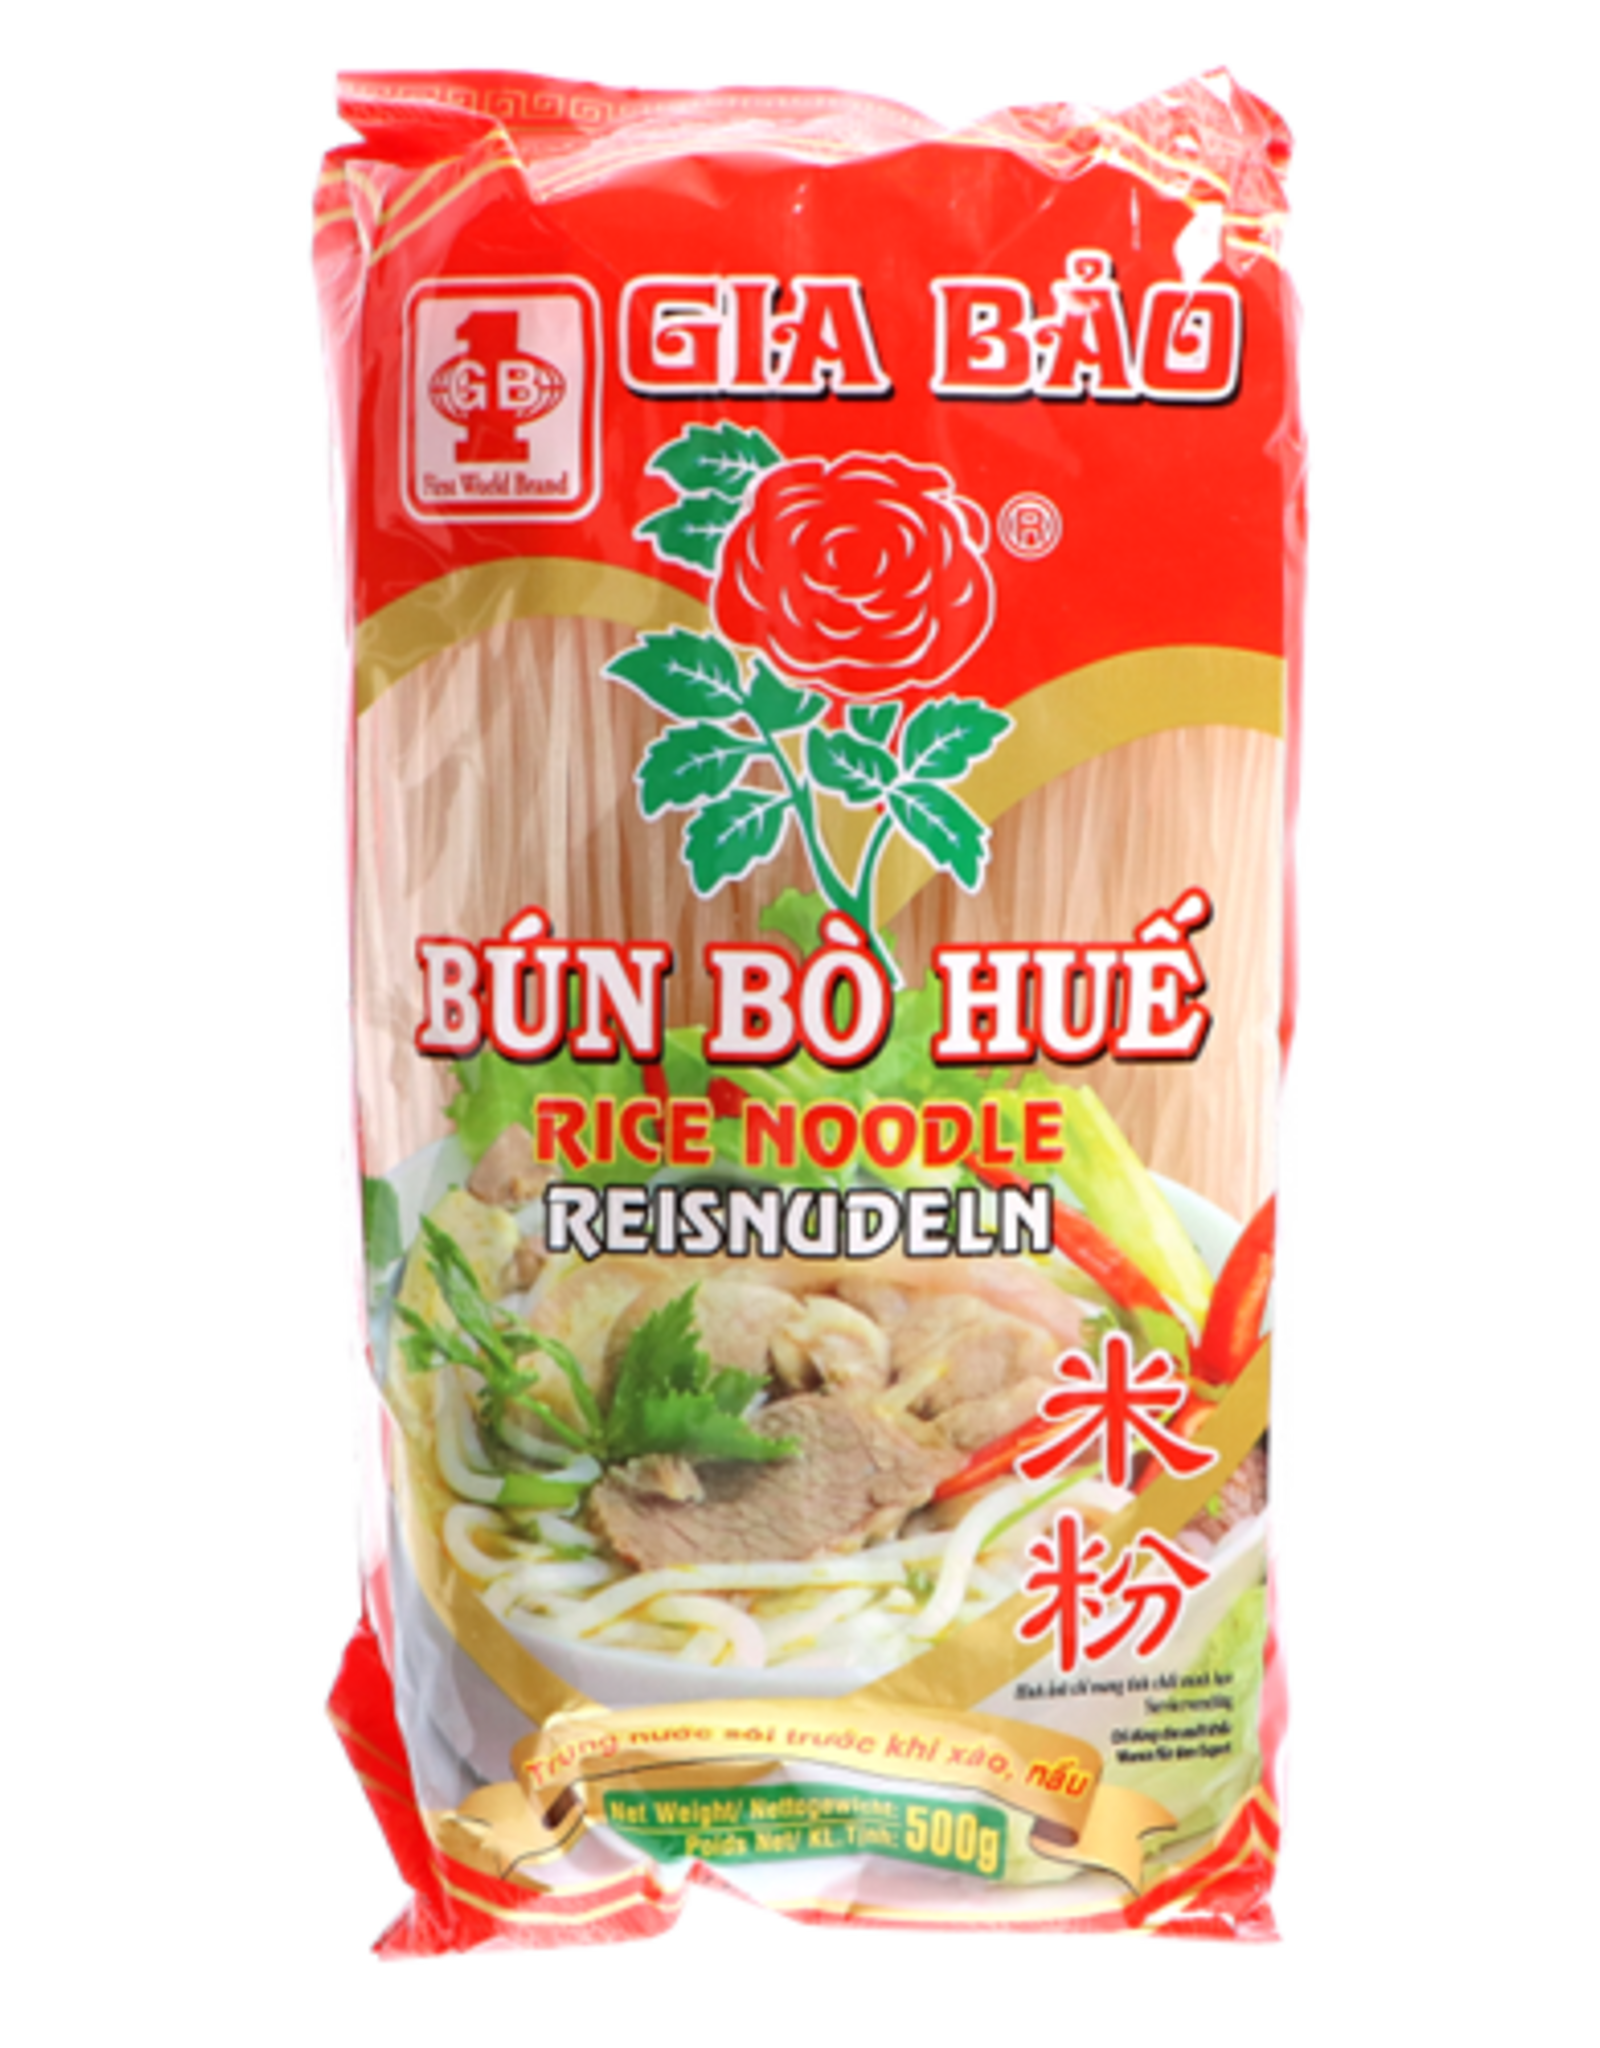 Gia Bao Bún Bò Huế Gia Bảo 1.5Mm